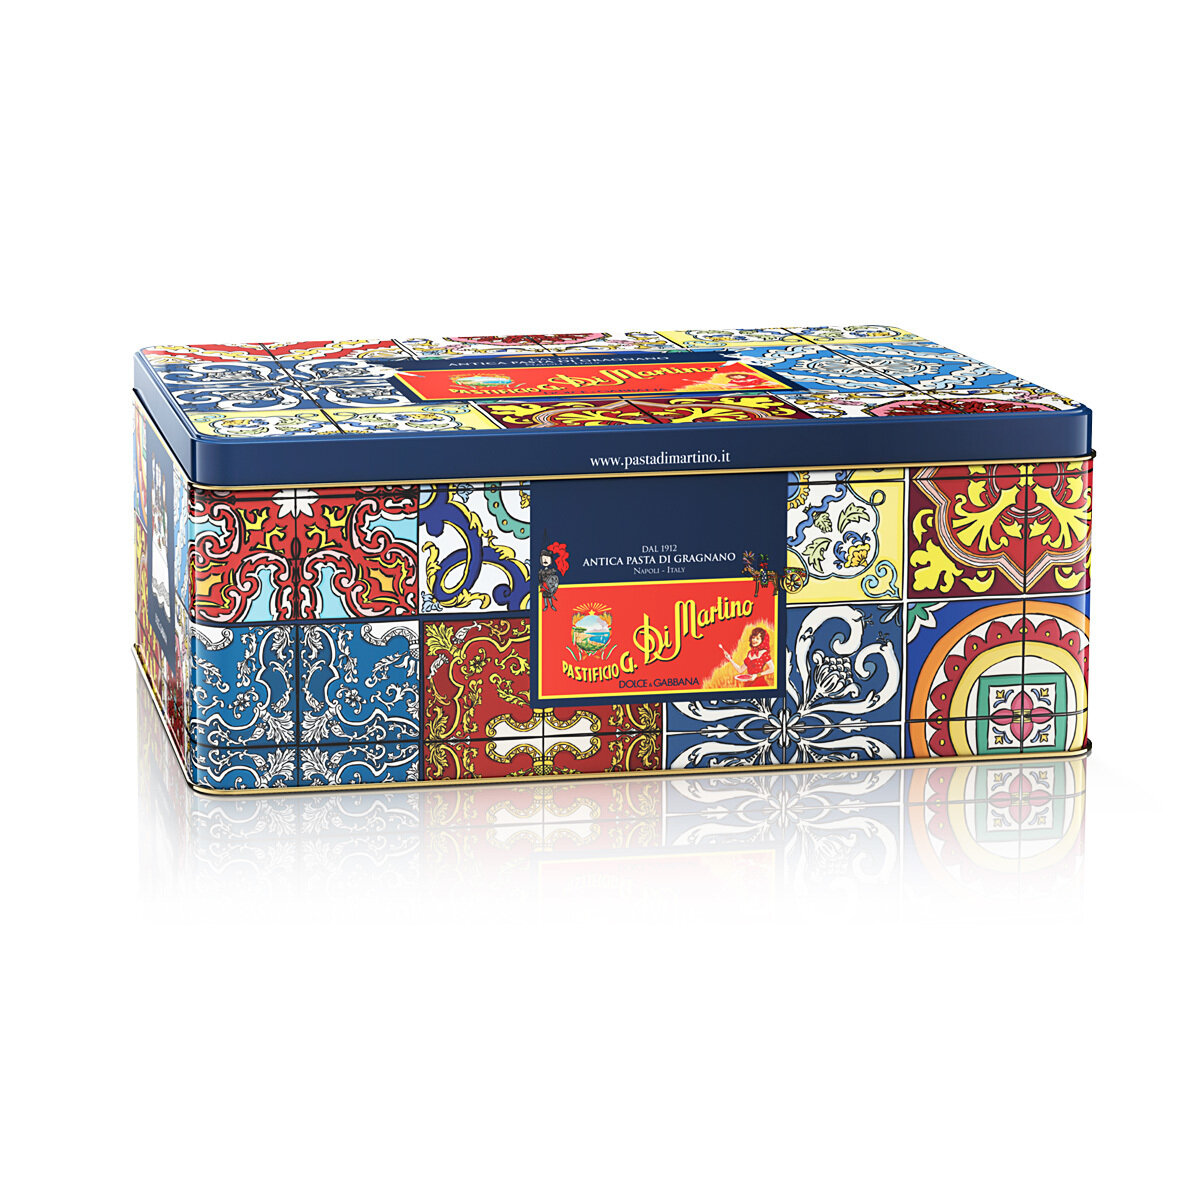 DOLCE & GABBANA AND DI MARTINO Erikoislahjapakkaus 5*500 G (+Esiliina)   Gift Box 5*500 G (+Apron)   METAL TIN